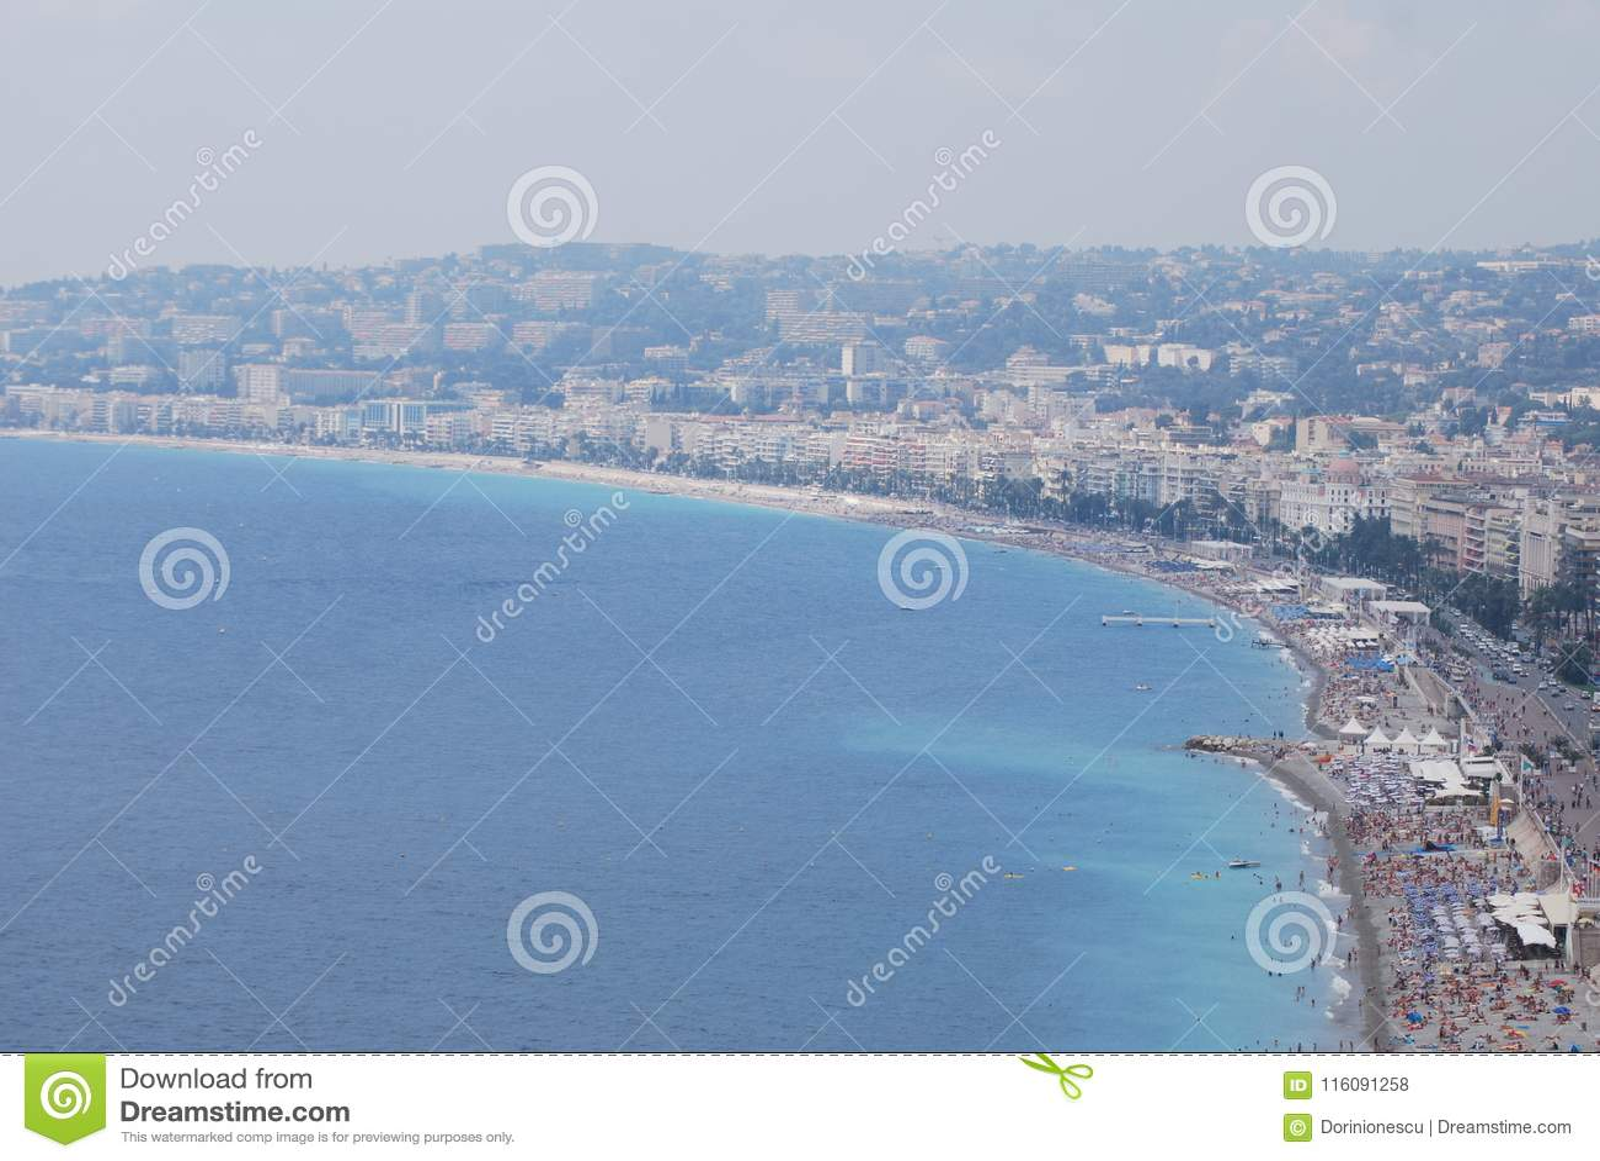 Nice, sea, coastal and oceanic landforms, coast, sky